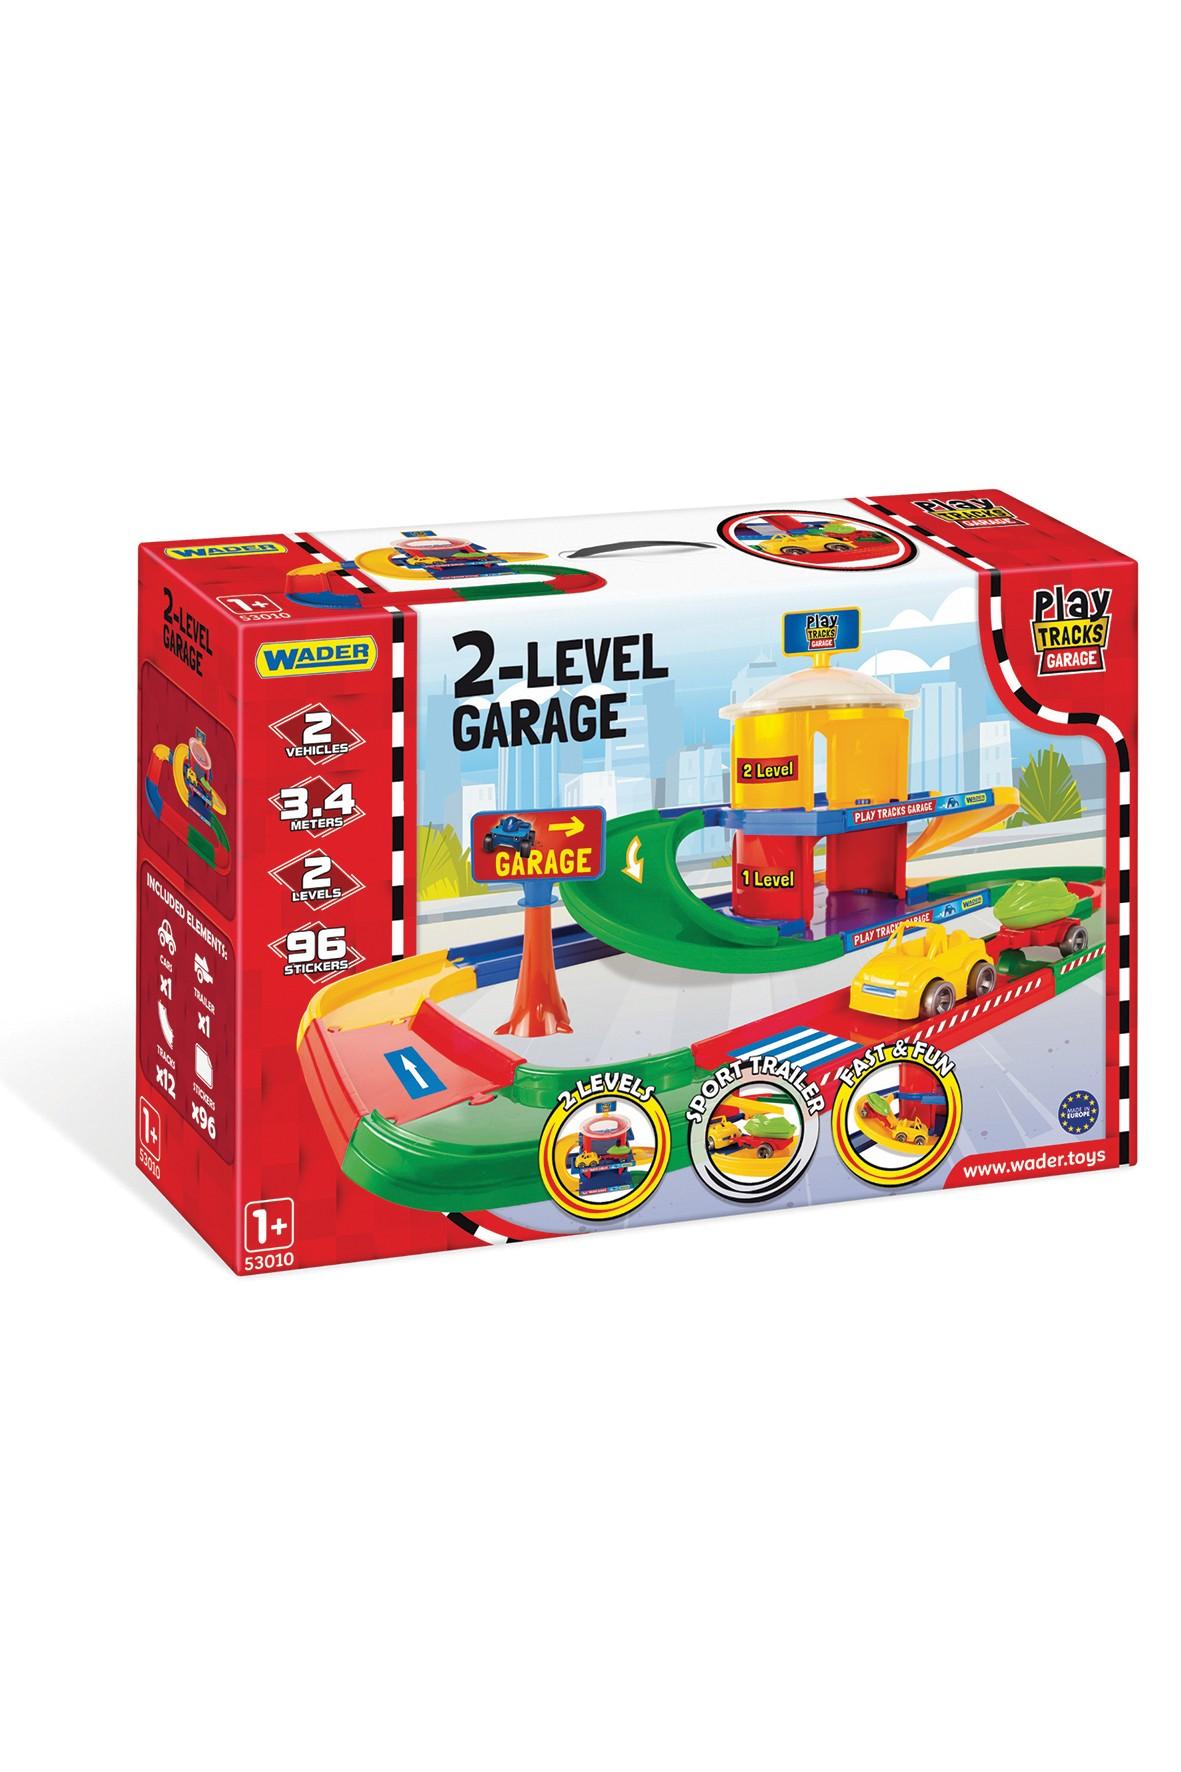 Garaż 2-poziomowy Play Tracks Garage